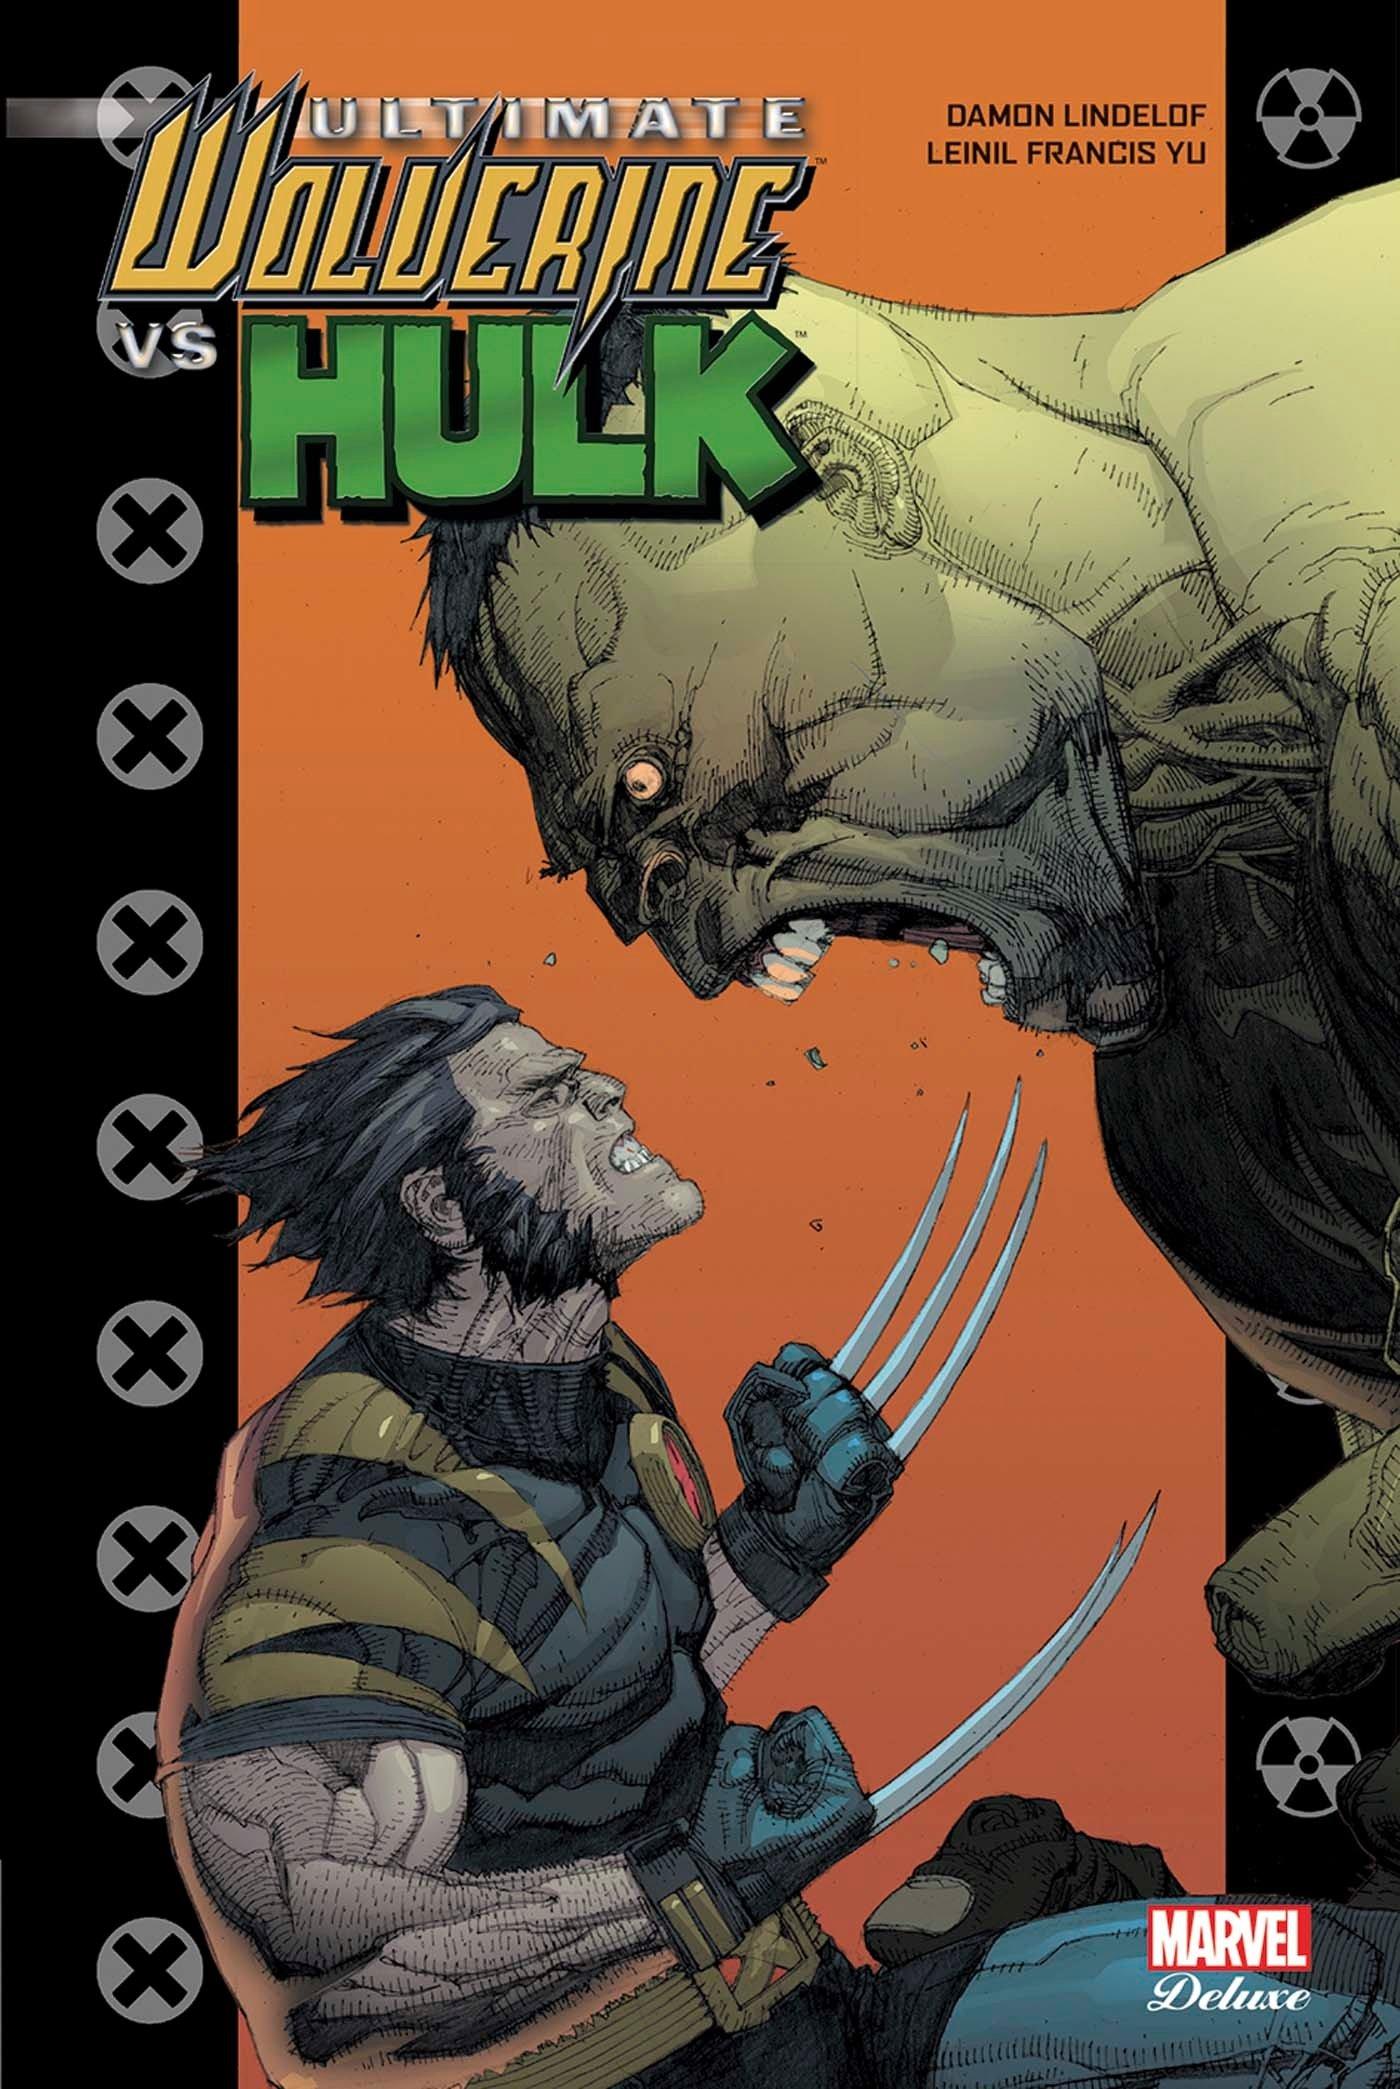 commencer marvel avec les comics ultimate